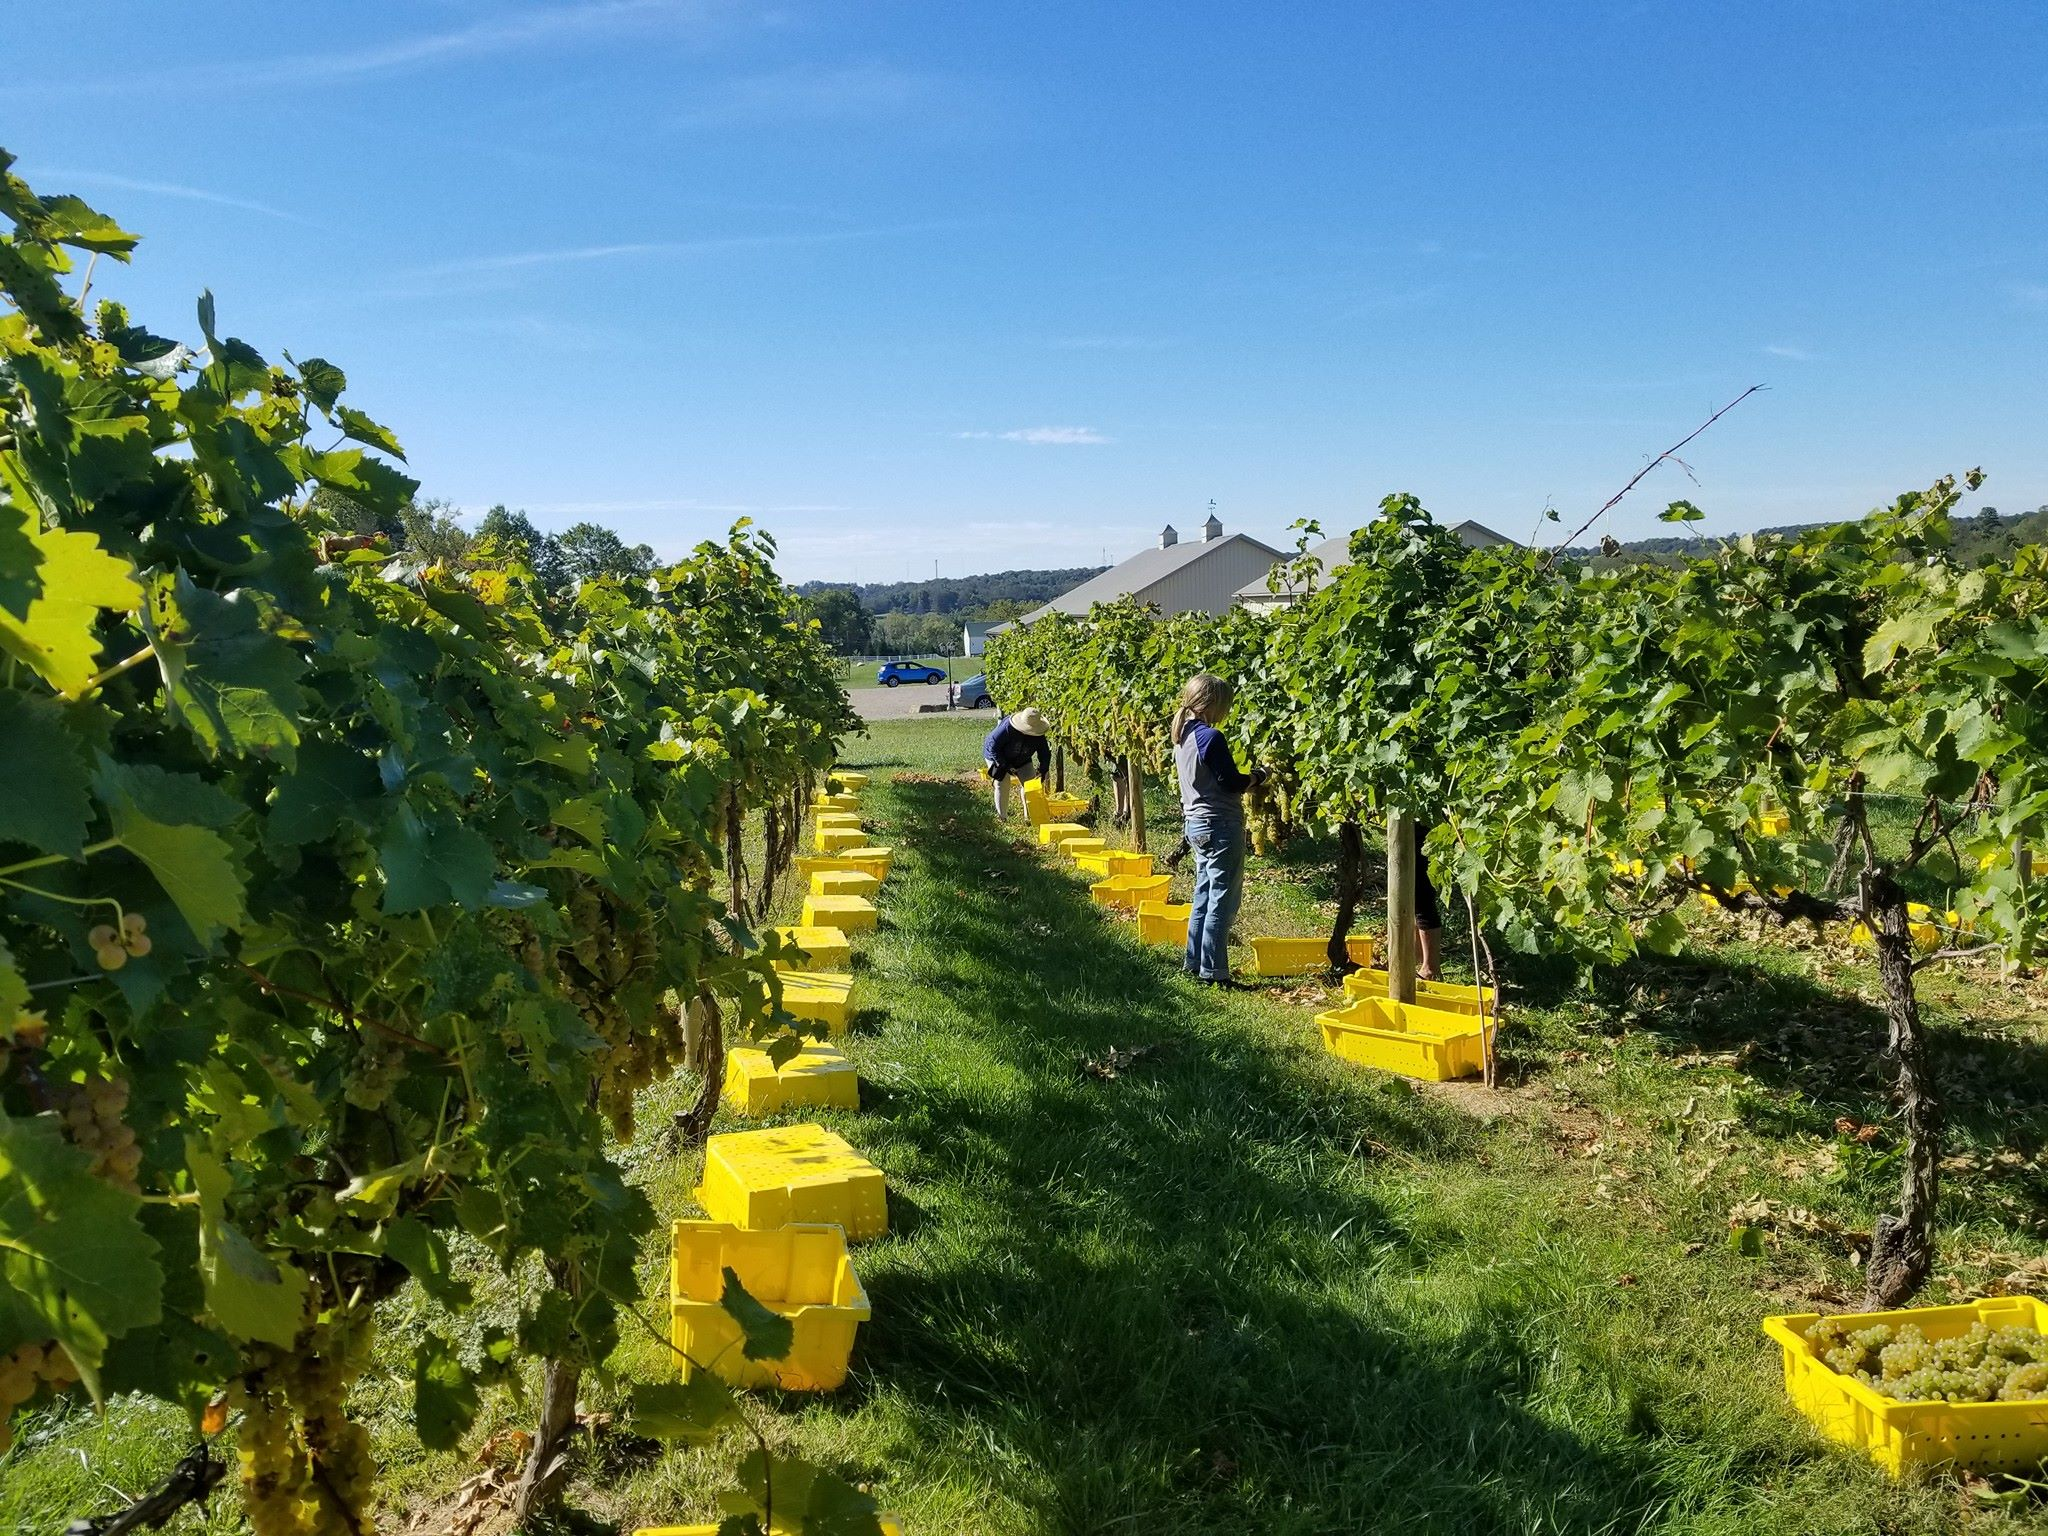 Best, Most Peaceful Winery In Ohio: Ravens Glenn Winery